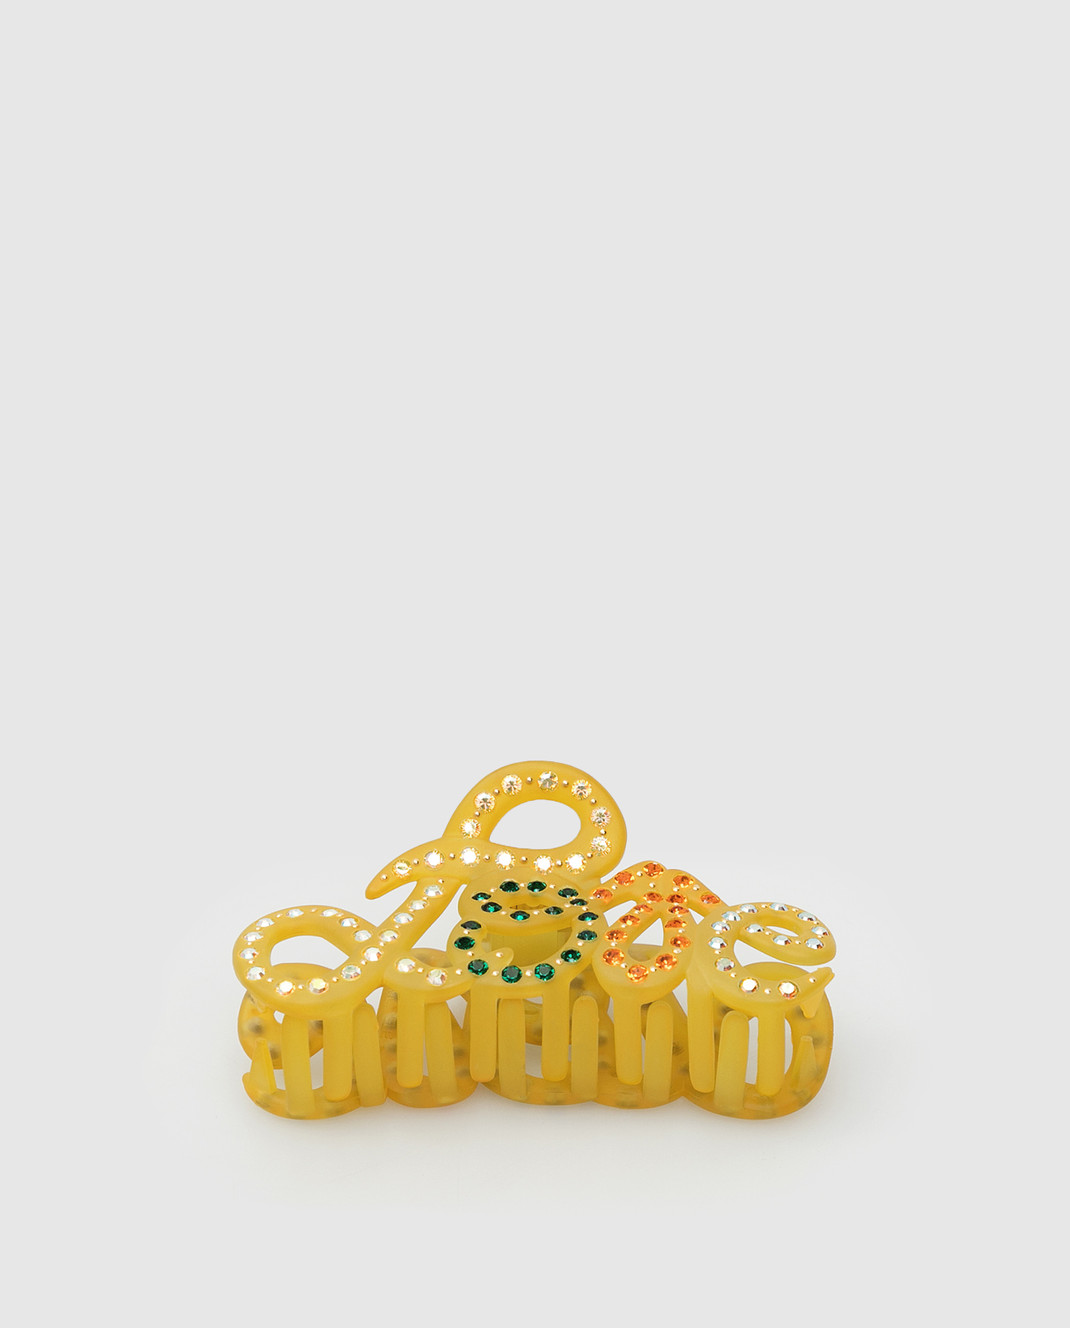 Davidian Желтый крабик с кристаллами 96163BIS